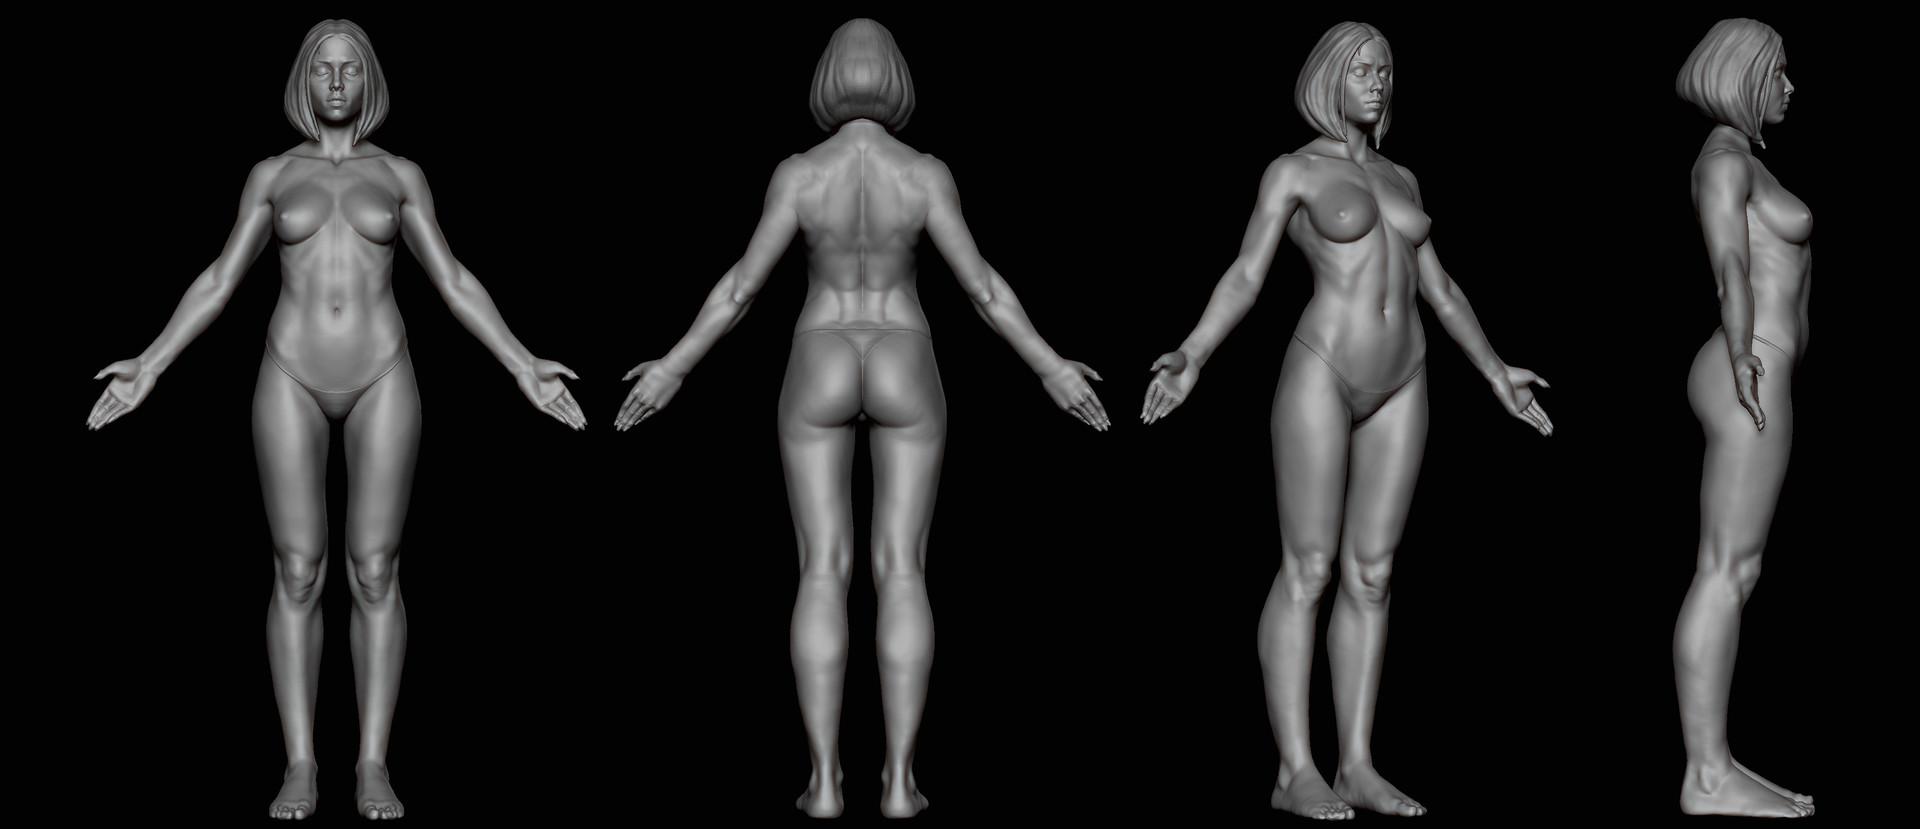 Daniel s rodrigues women anatomy 001